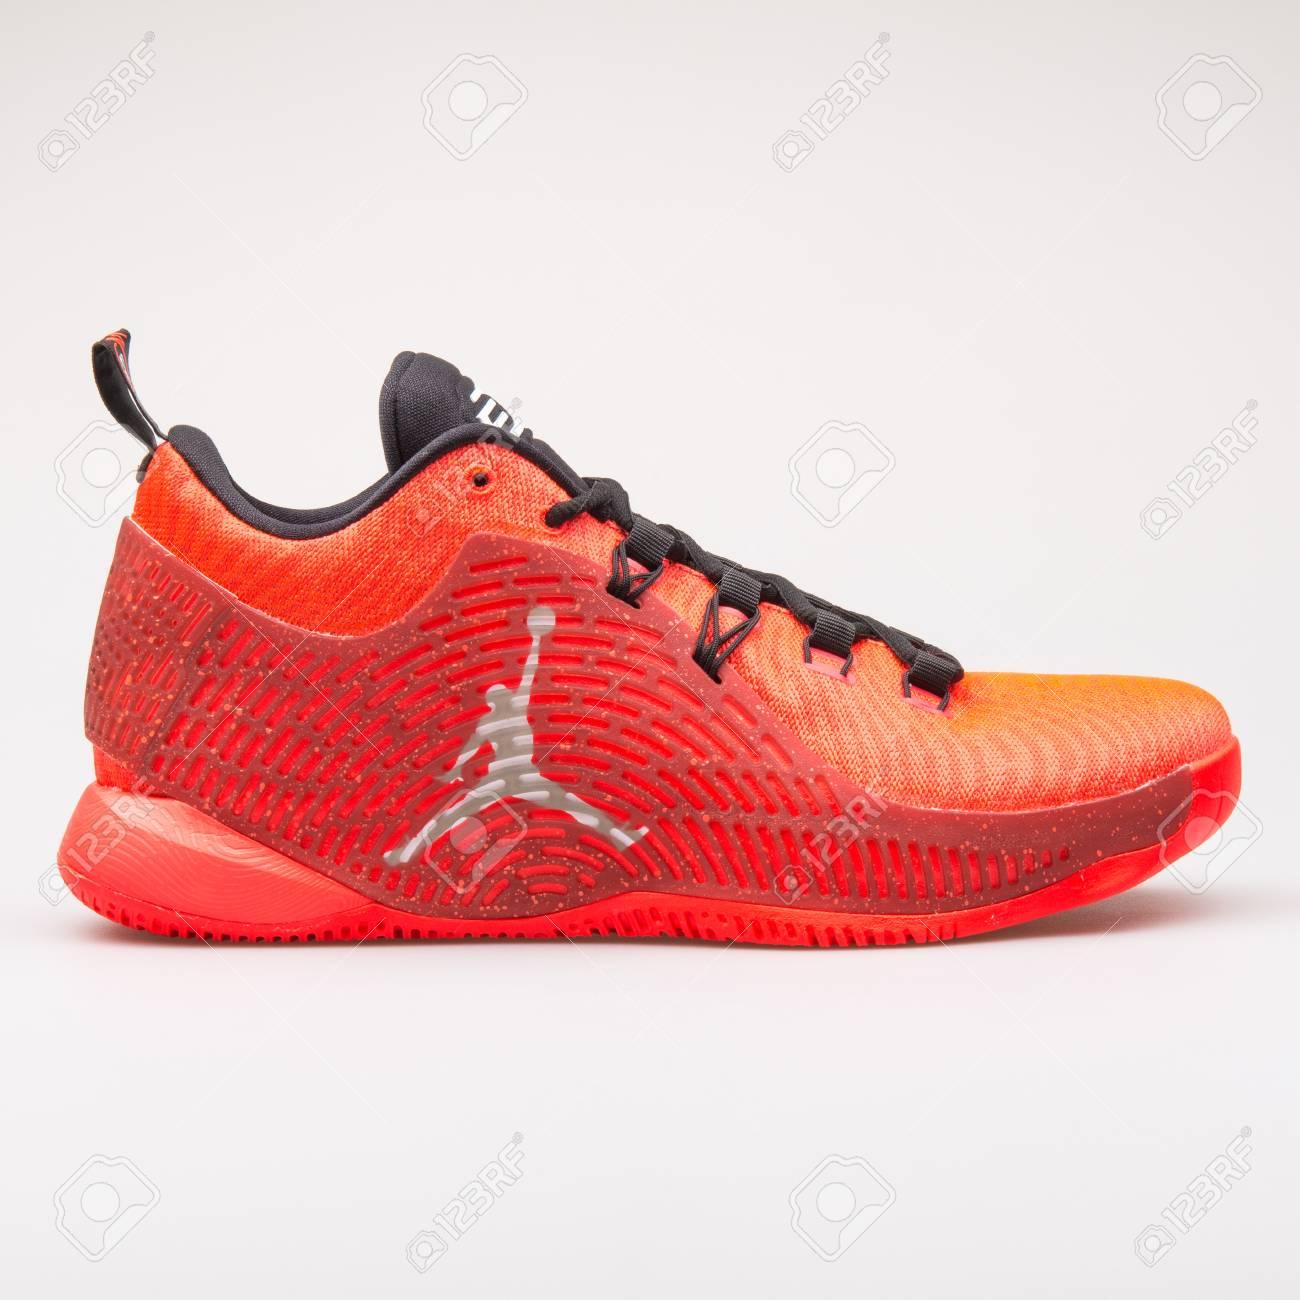 Nike Jordan CP3X Red Sneaker.. Stock